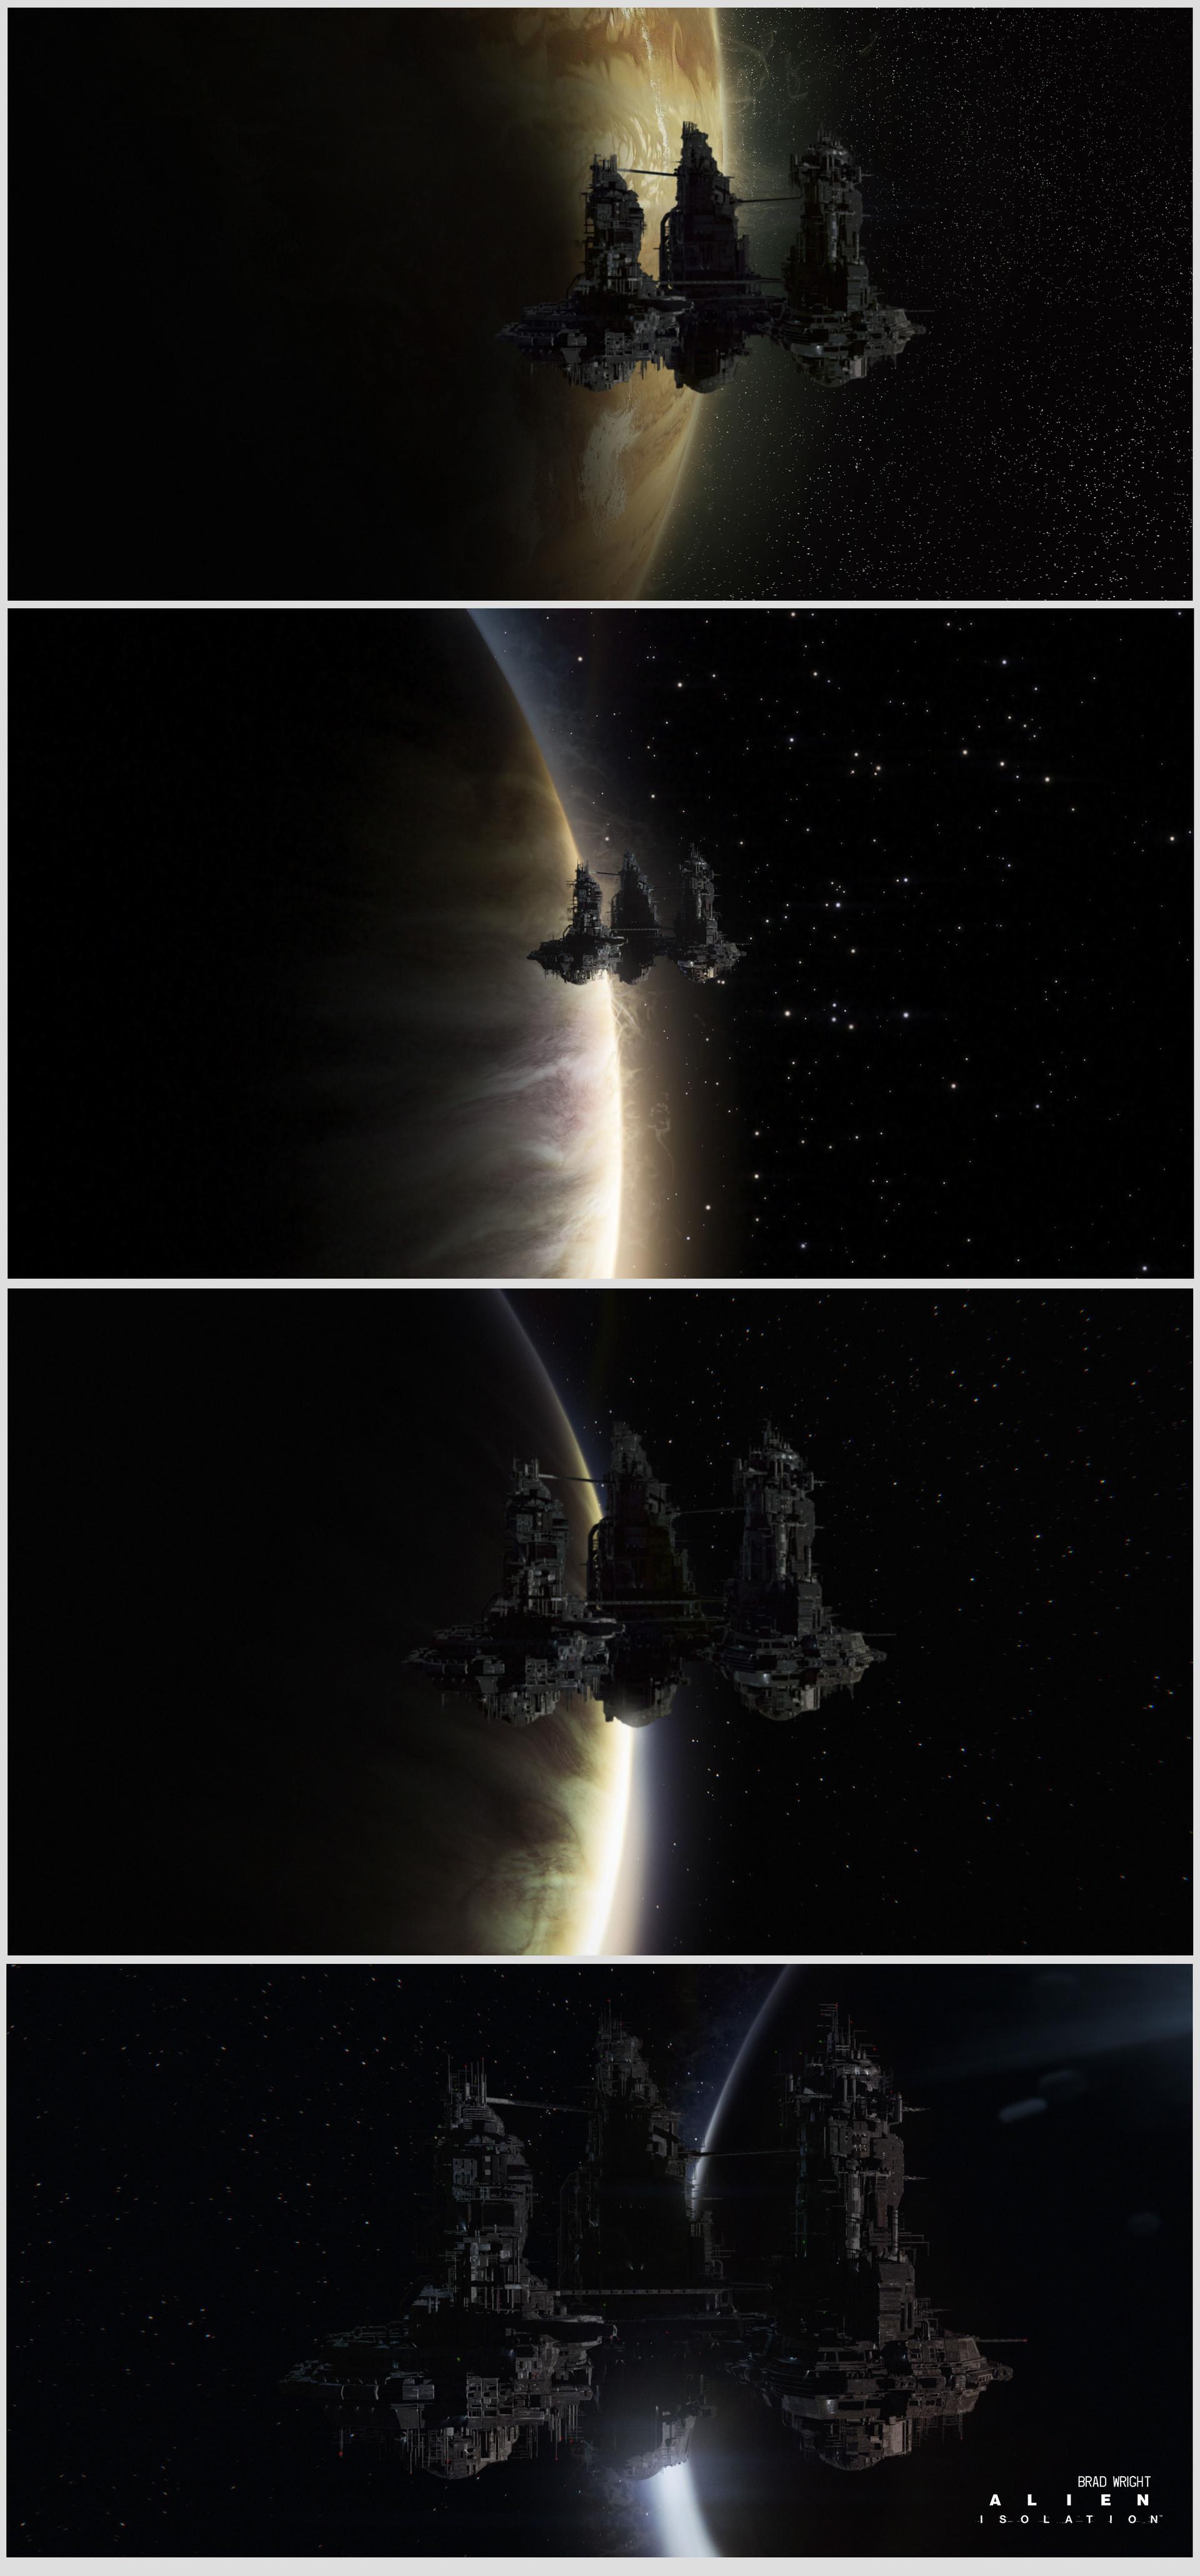 Brx wright shot exploration